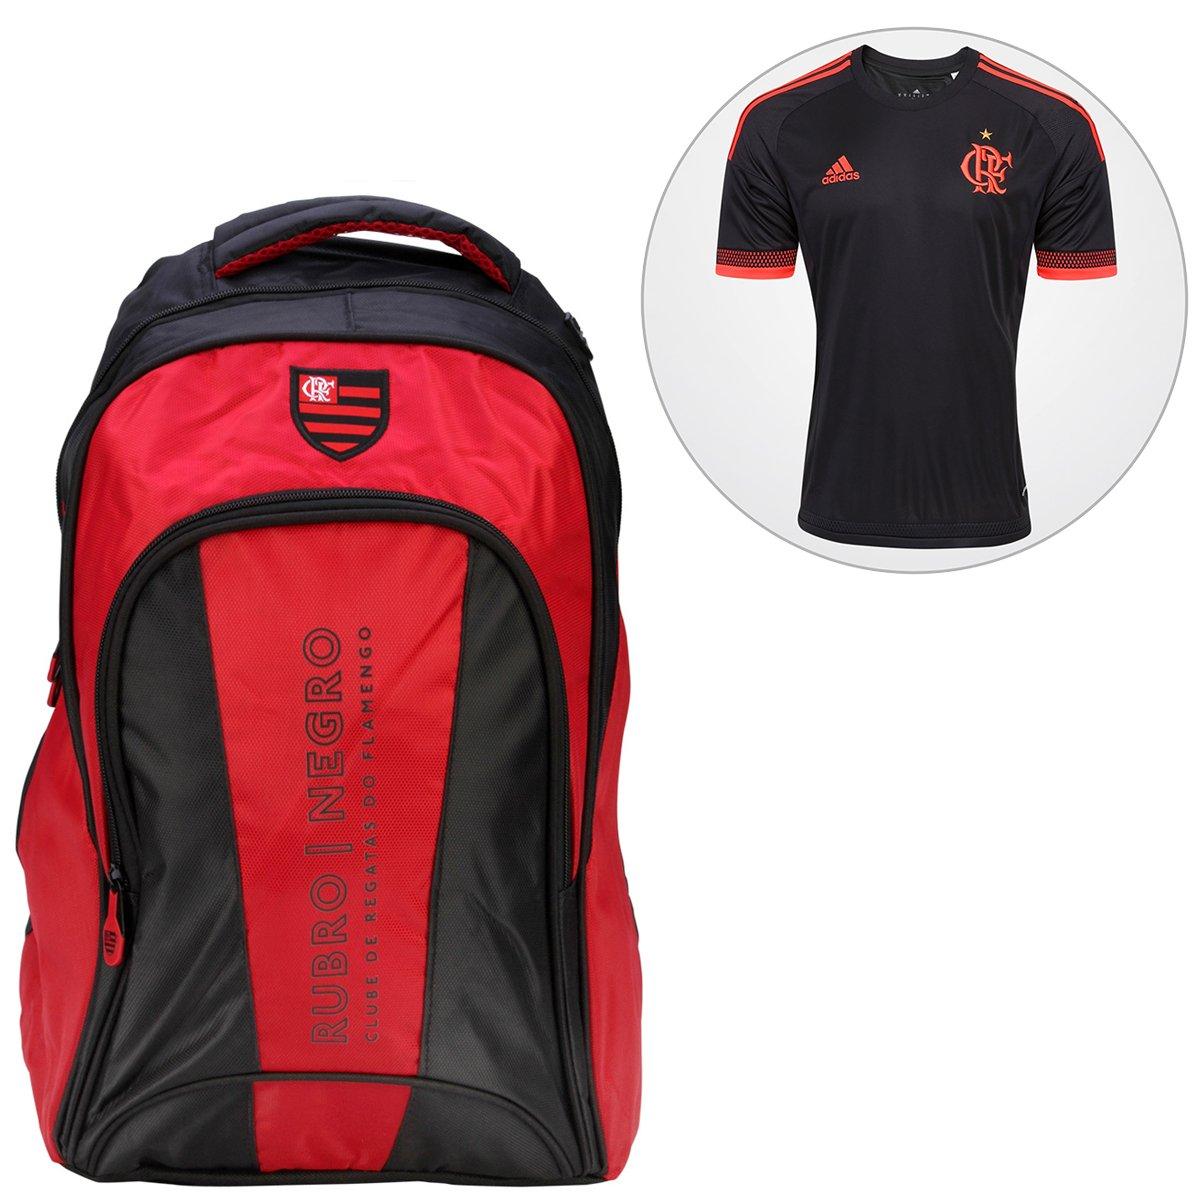 Kit Camisa Adidas Flamengo III 2016 s nº + Mochila Flamengo - Compre Agora   b2e48ae543c4e